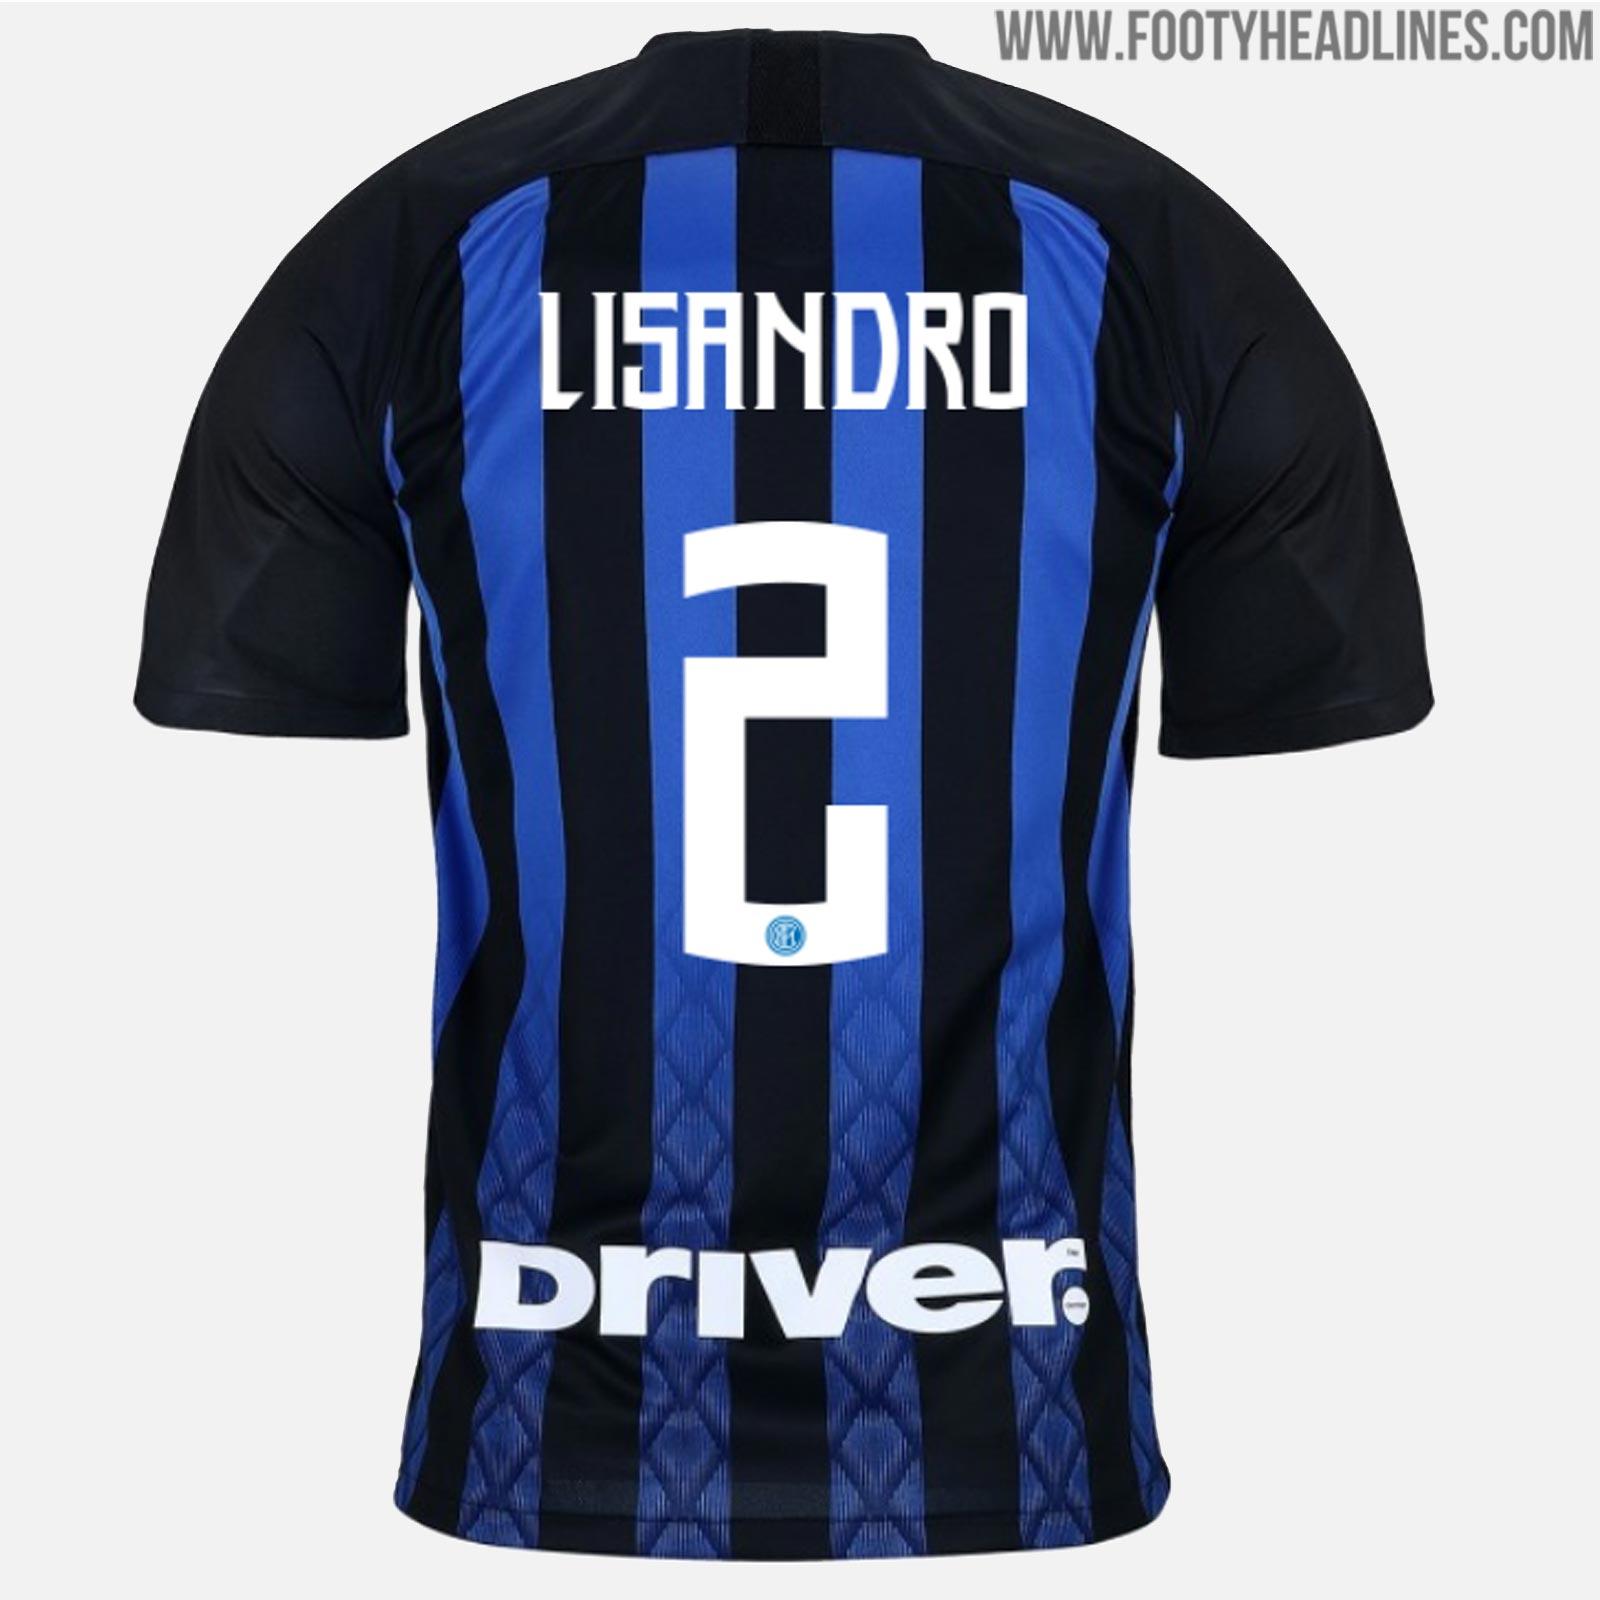 f1b048daf All-New Unique Inter Milan 18-19 Kit Font Revealed